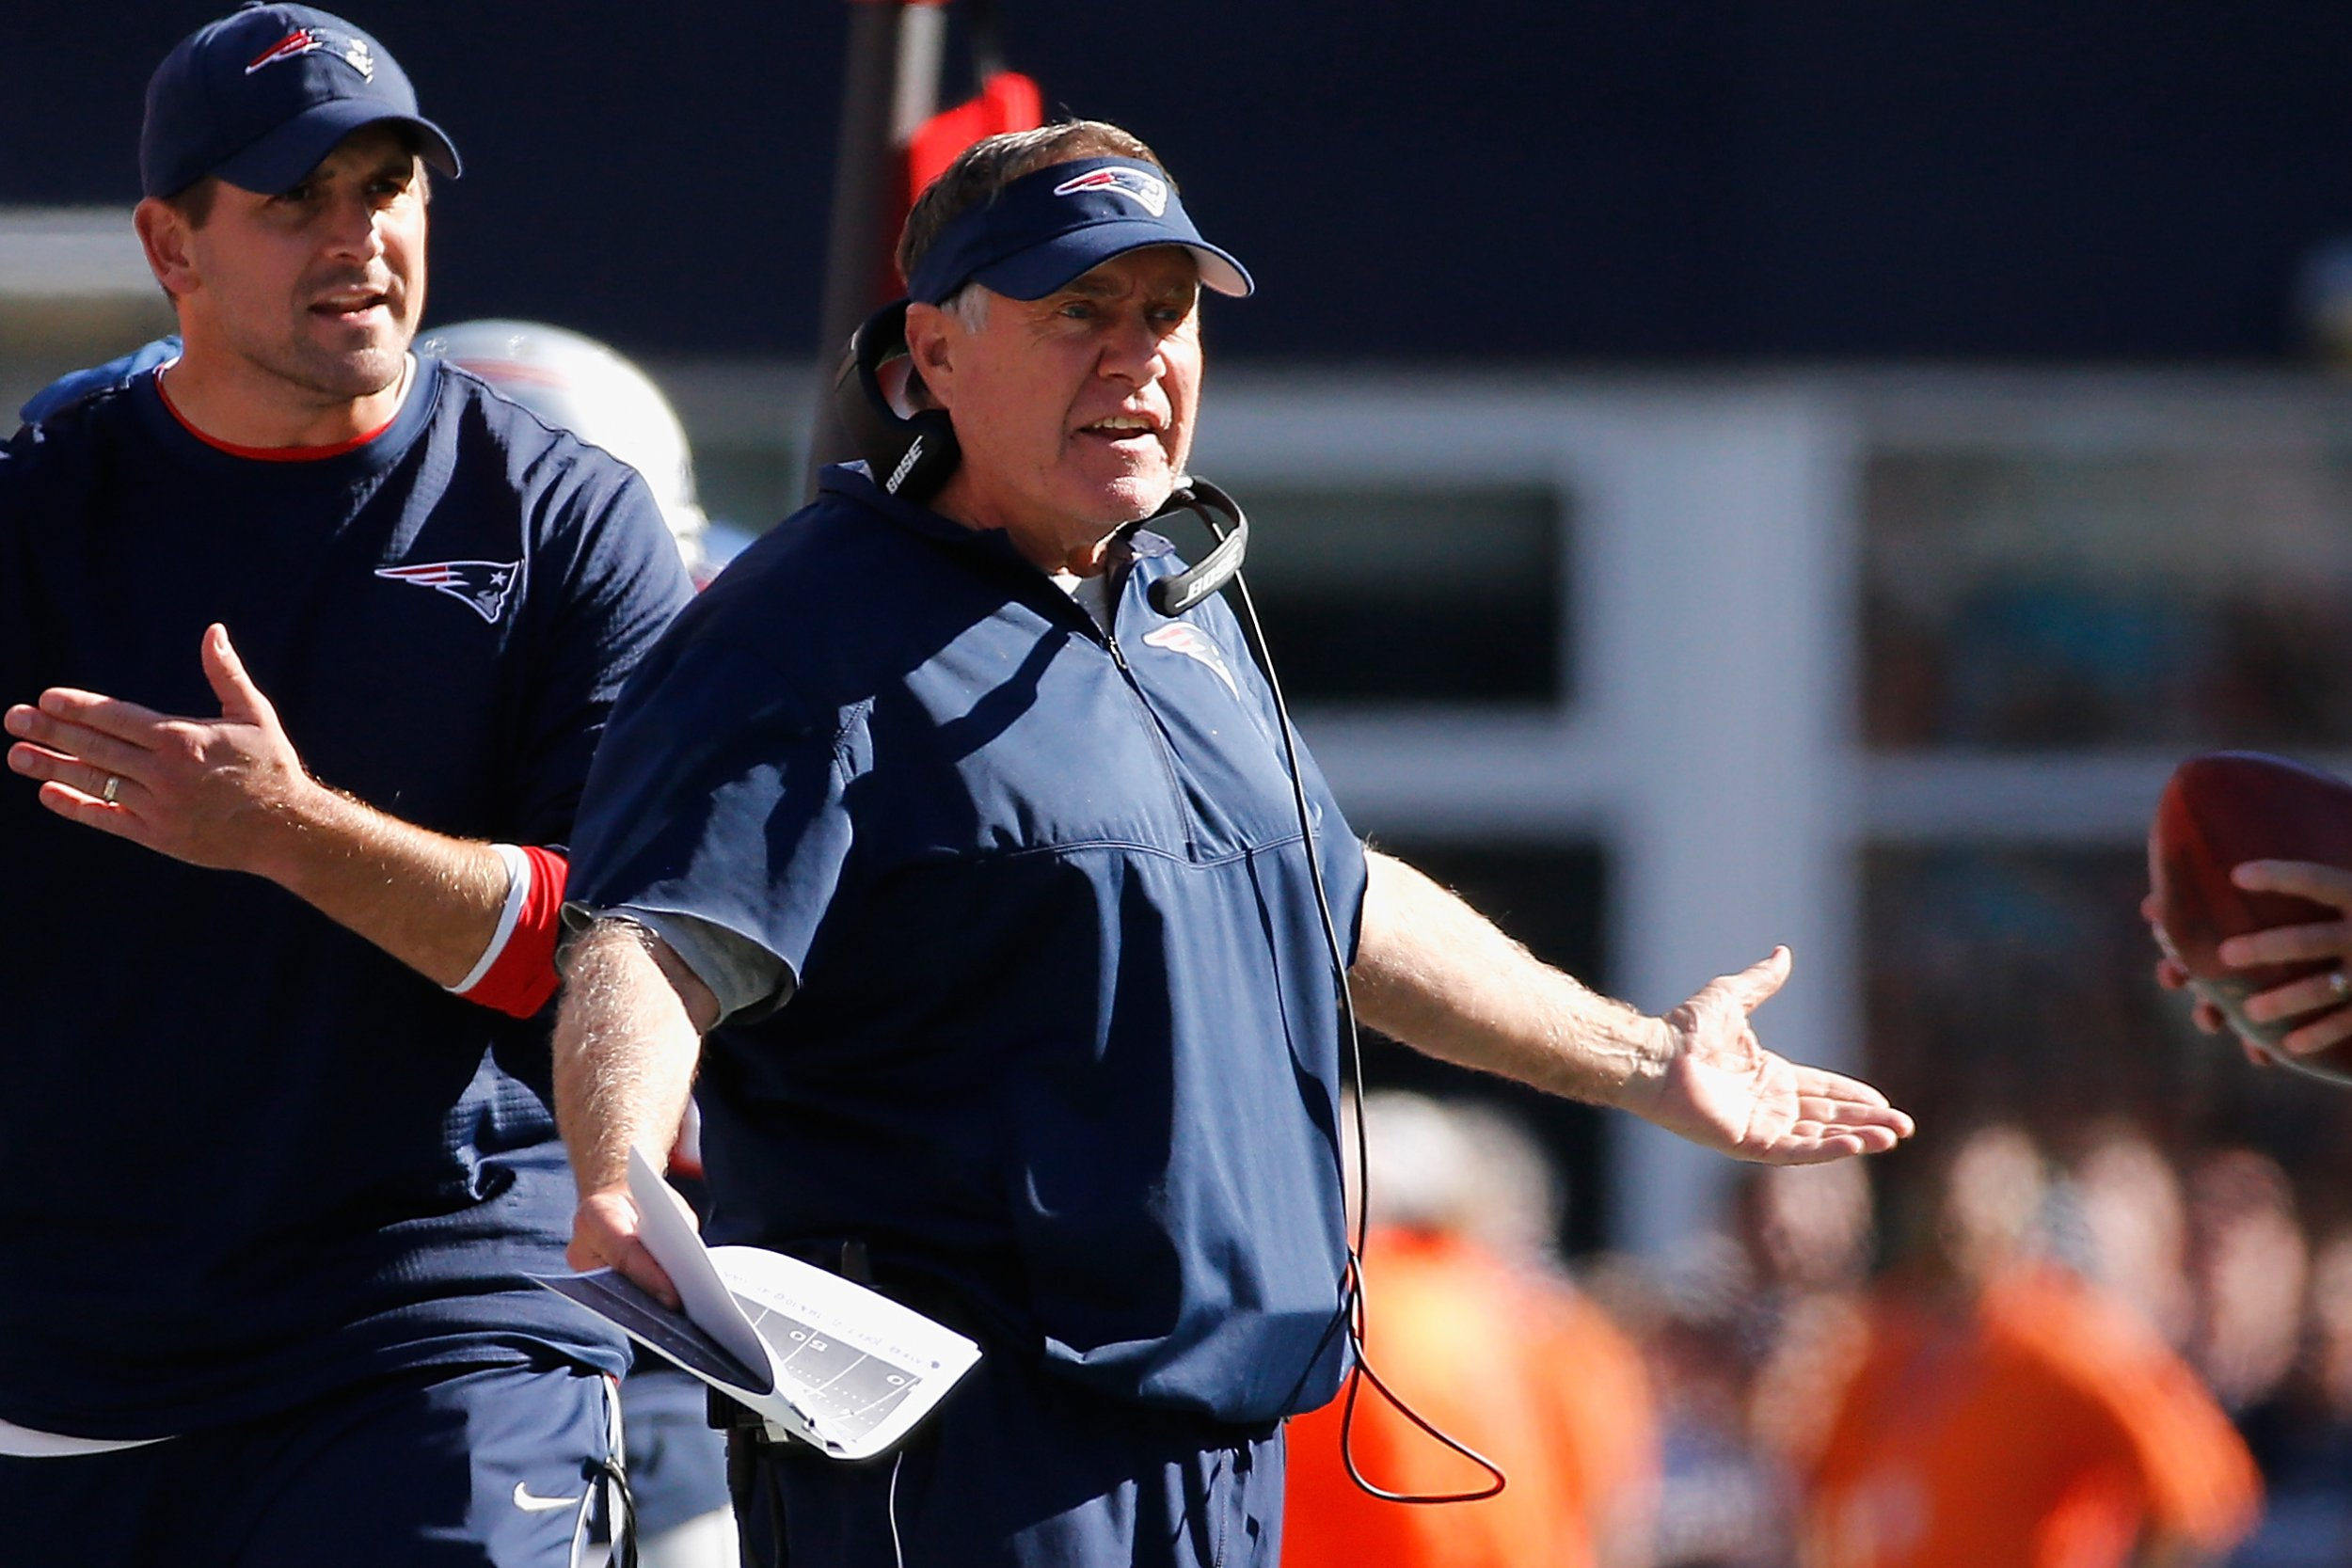 New England Patriots head coach Bill Belichick at Gillette Stadium, Massachusetts, October 1.